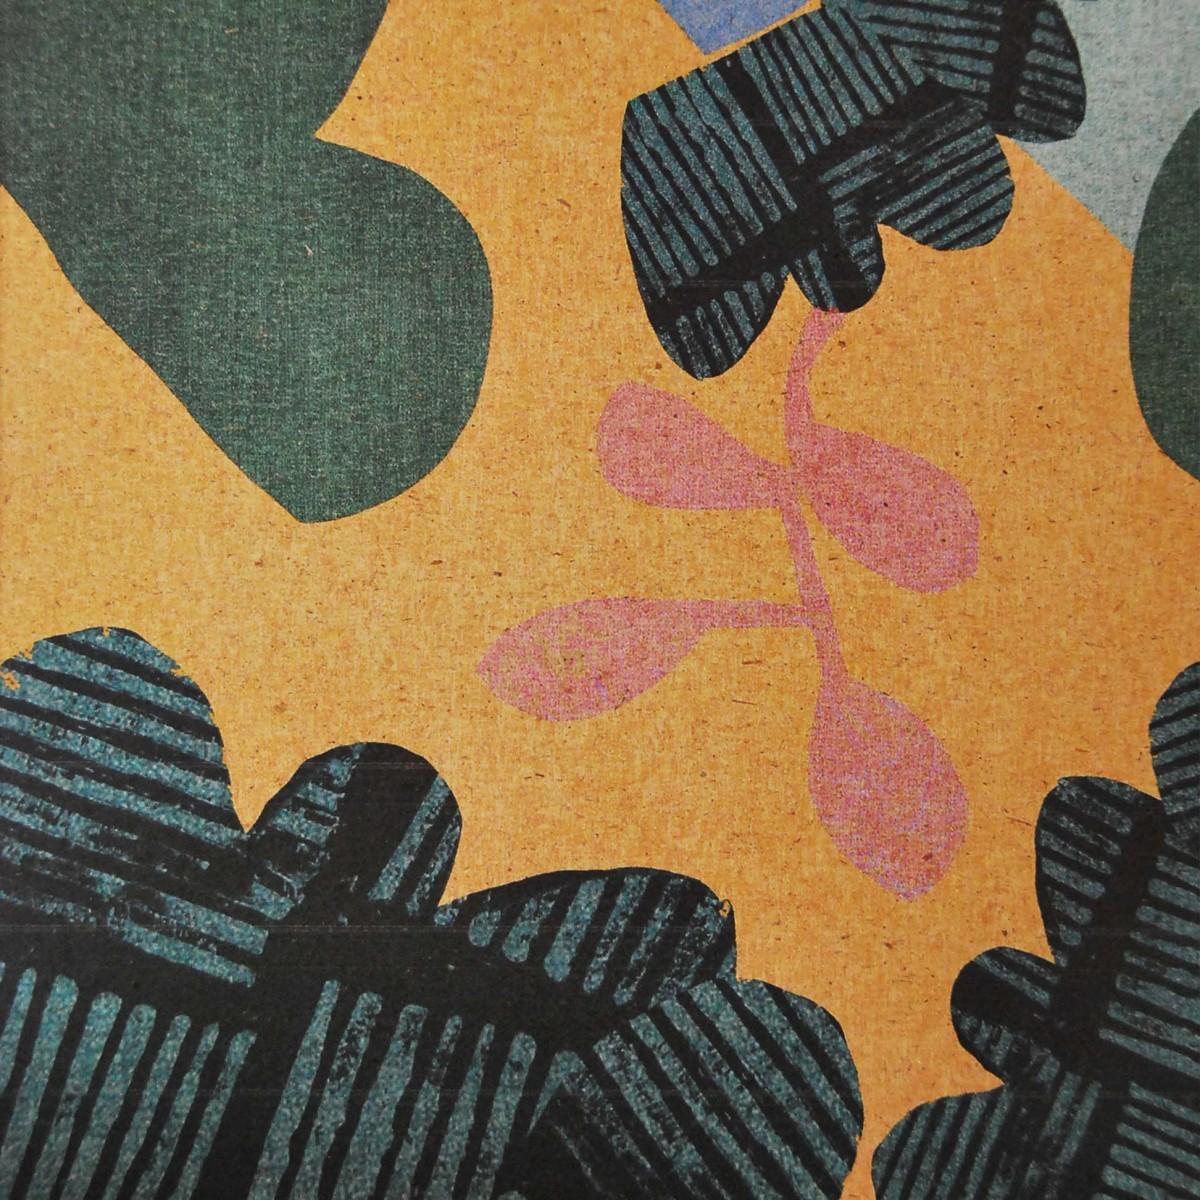 formwiese - »Morgentau« (A3 Poster, Graspapier)